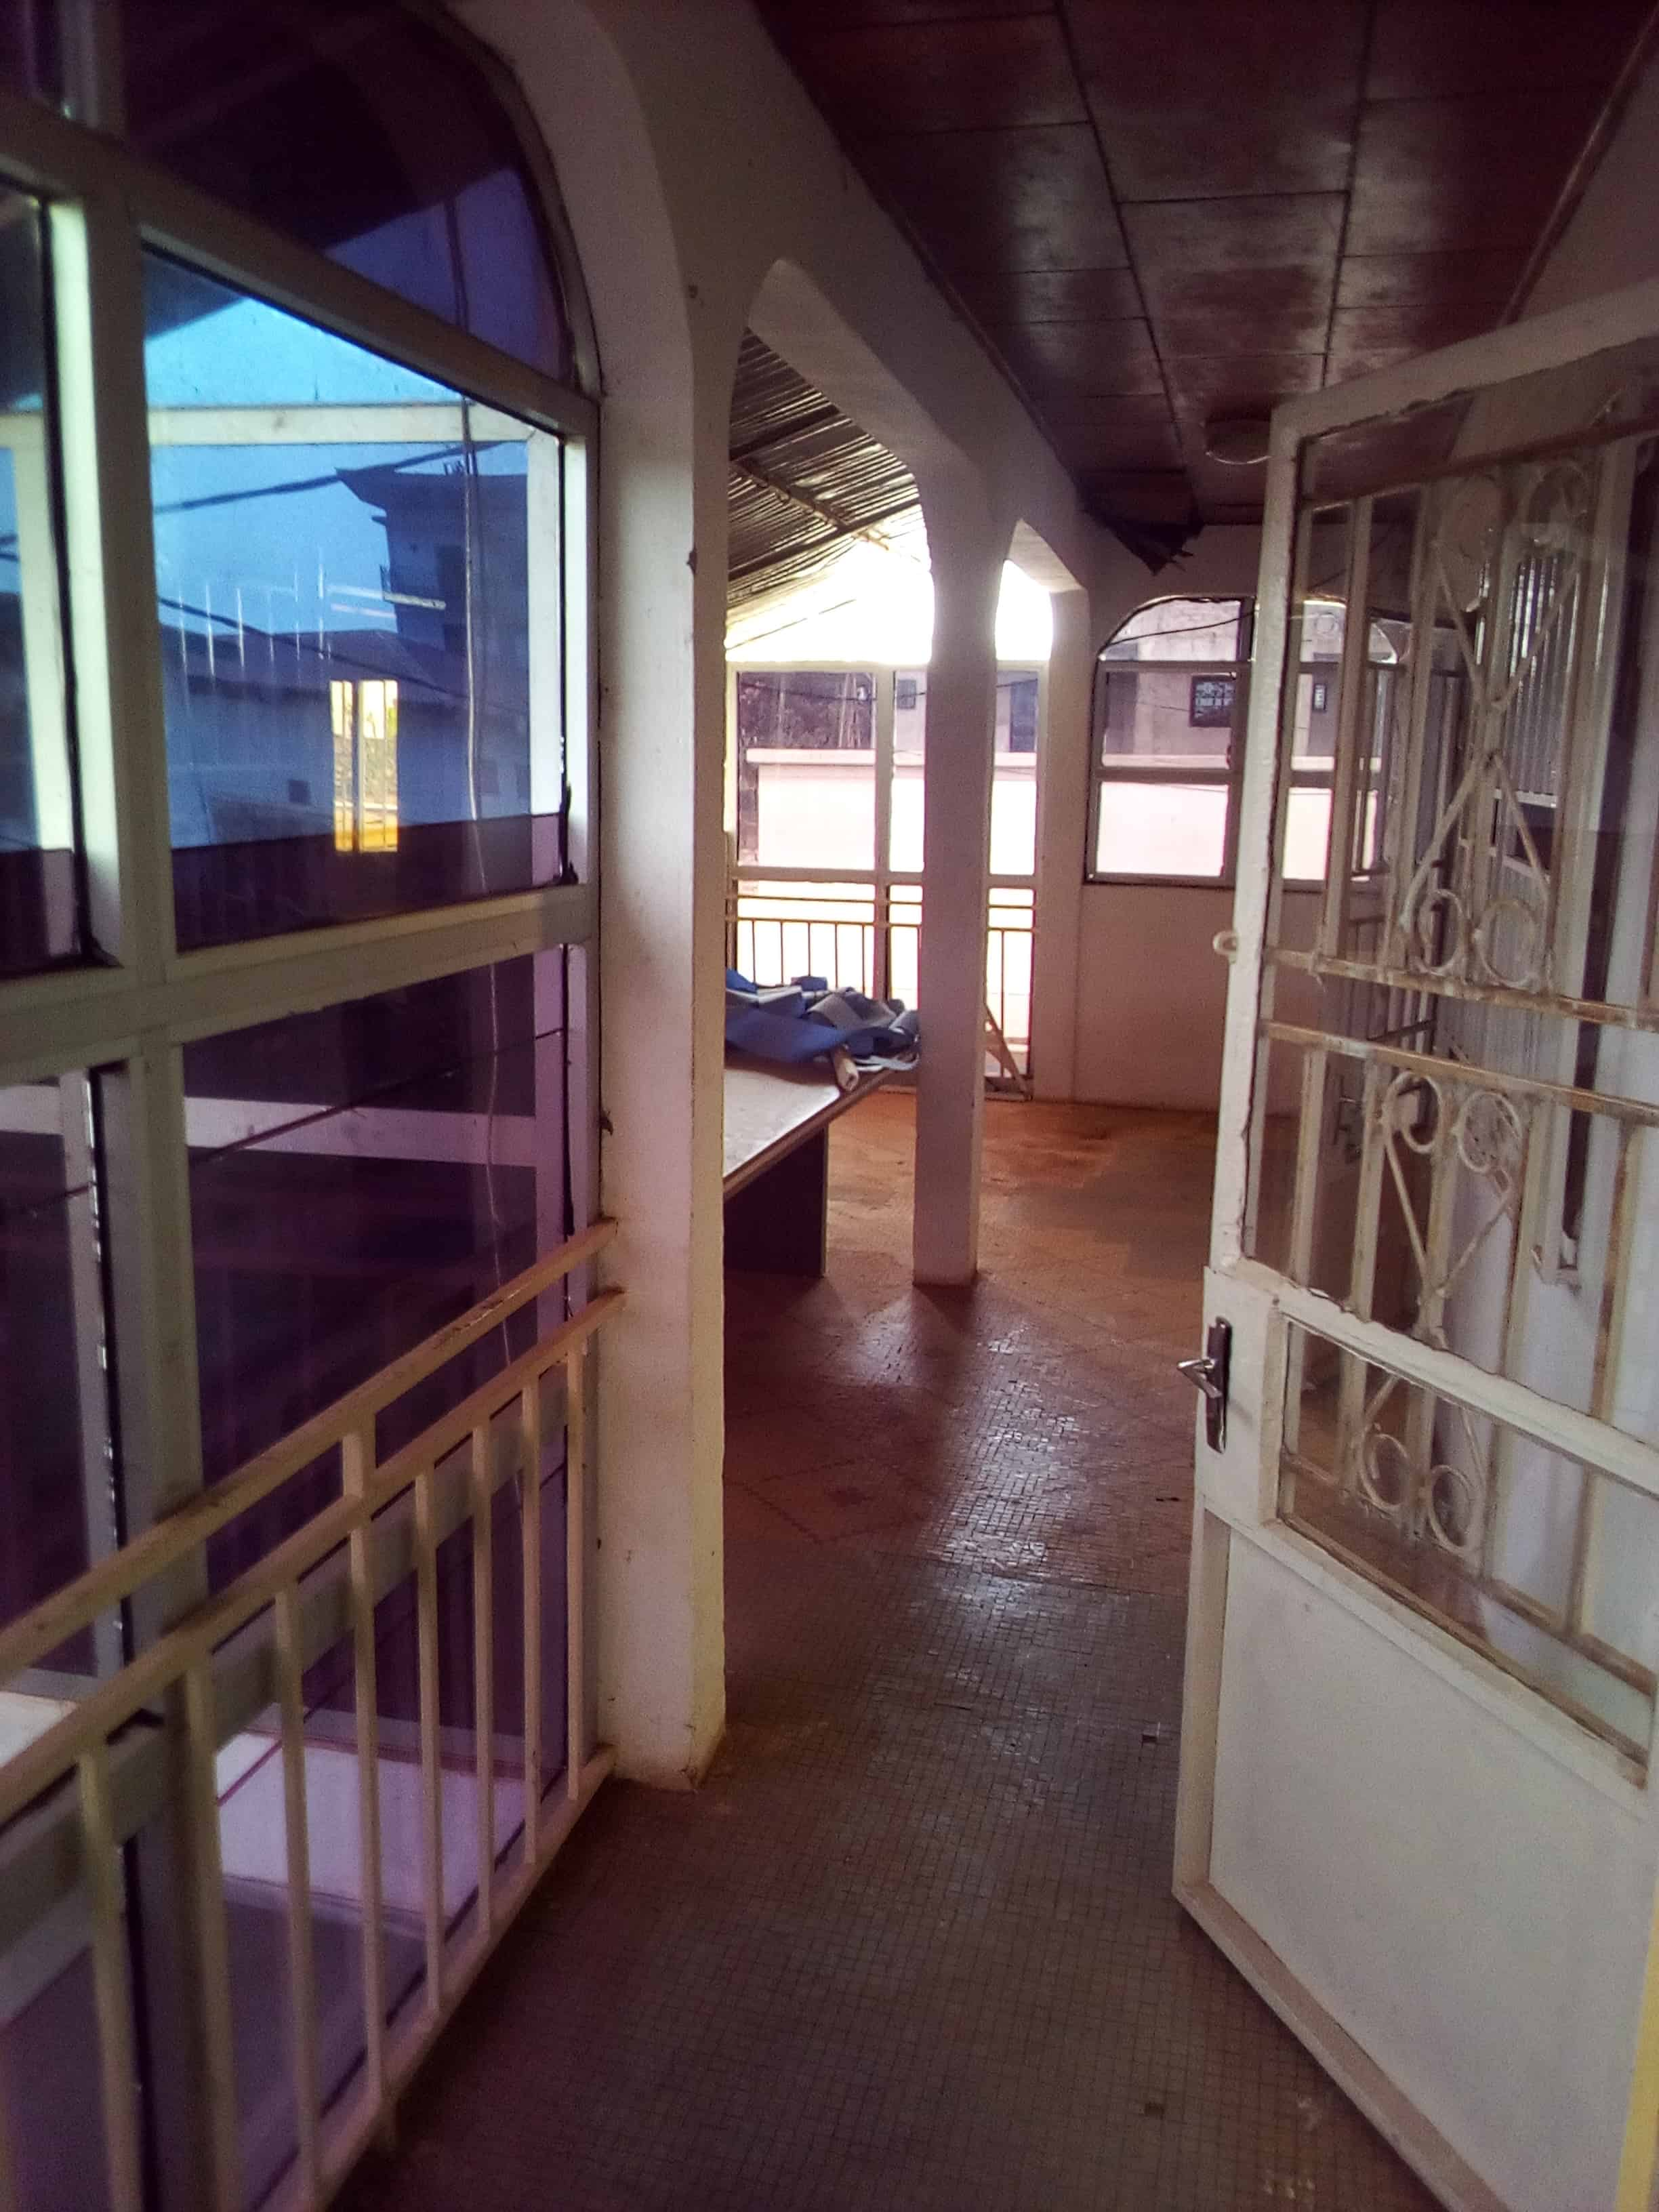 Office to rent at Yaoundé, Mfandena, OMNISPORT - 100 m2 - 300 000 FCFA